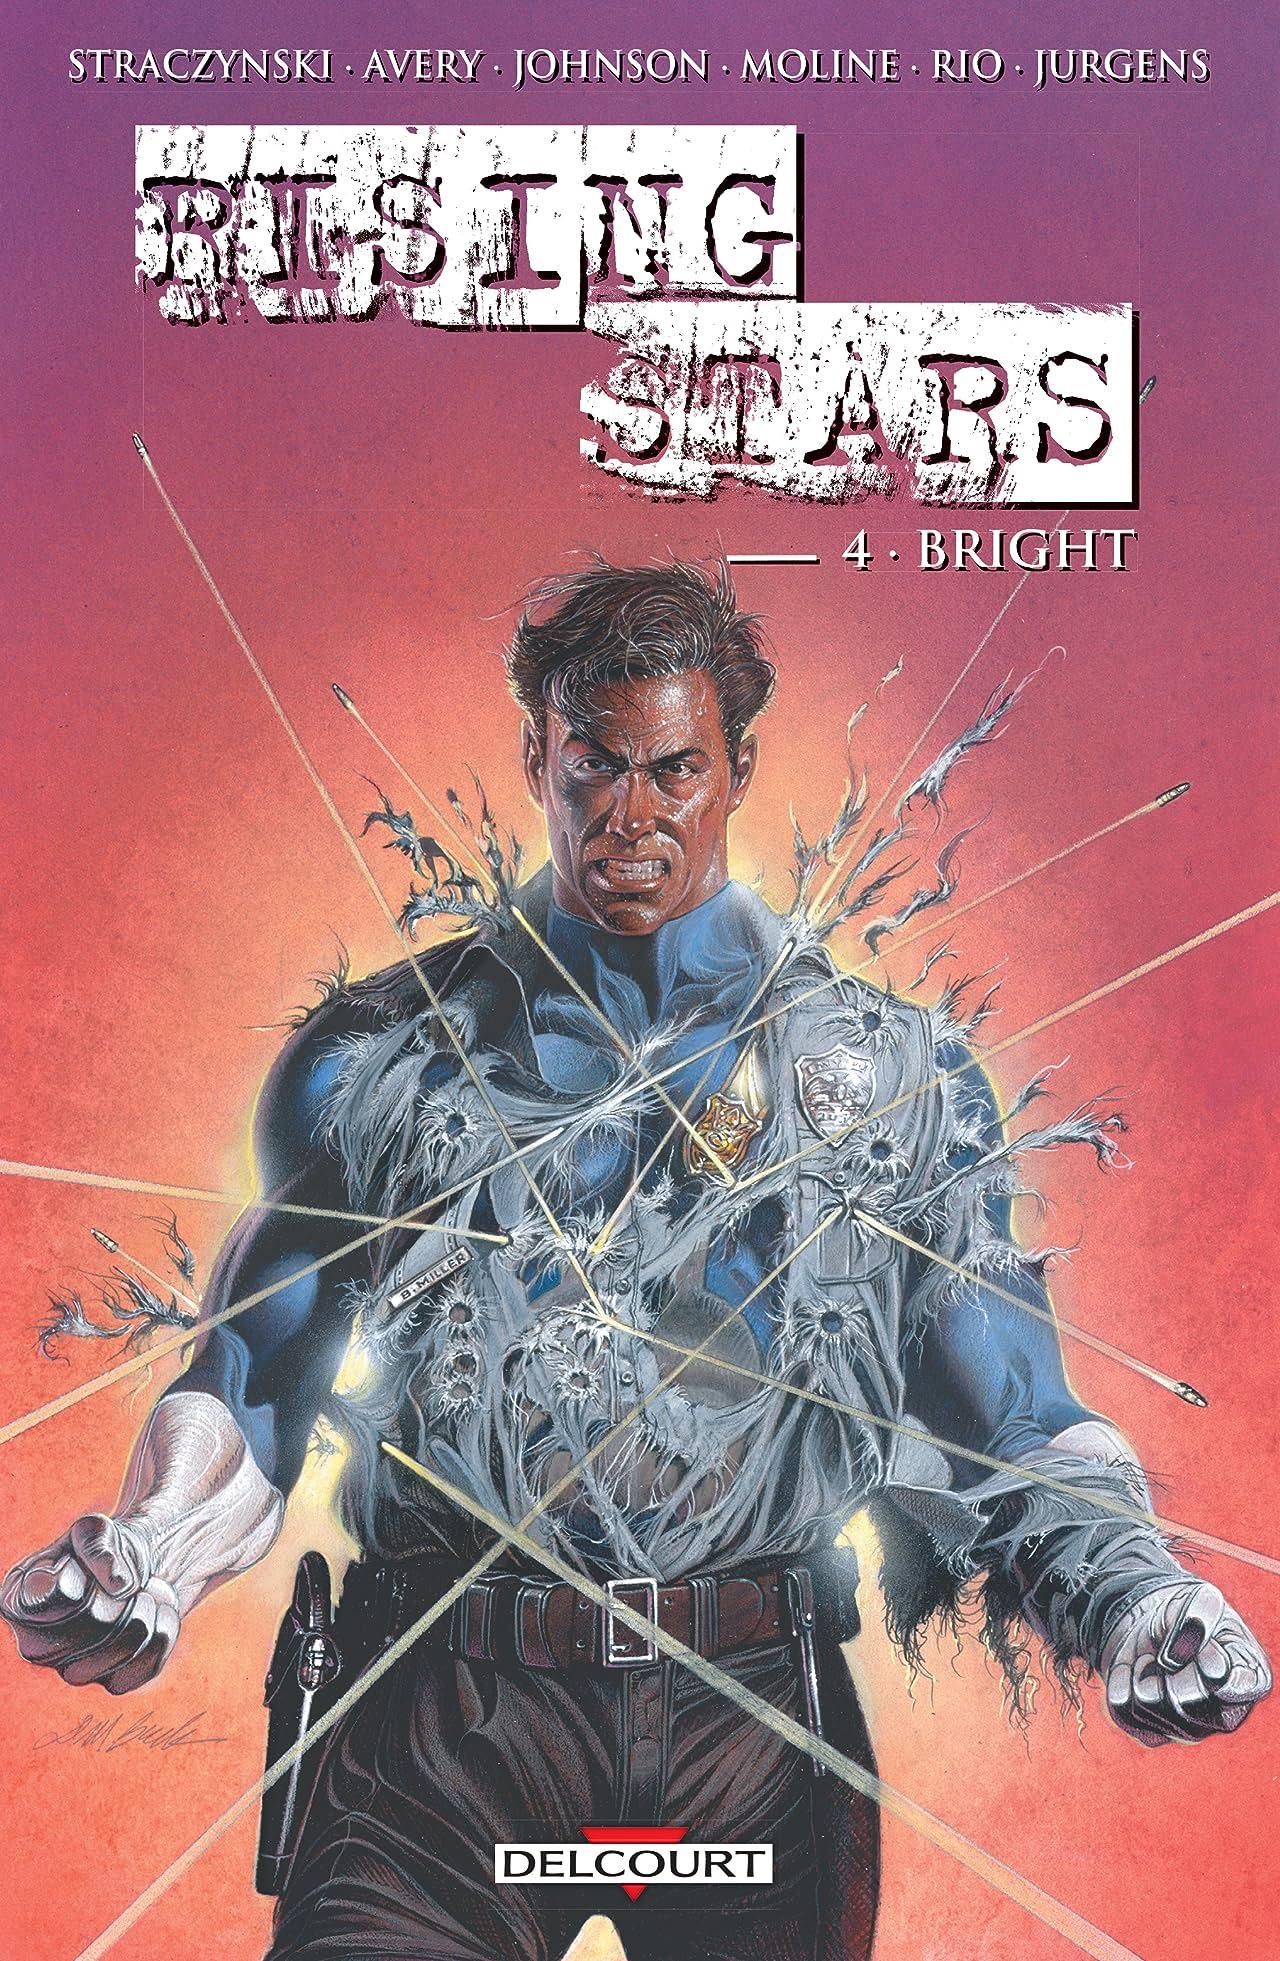 Rising stars Vol. 4: Bright